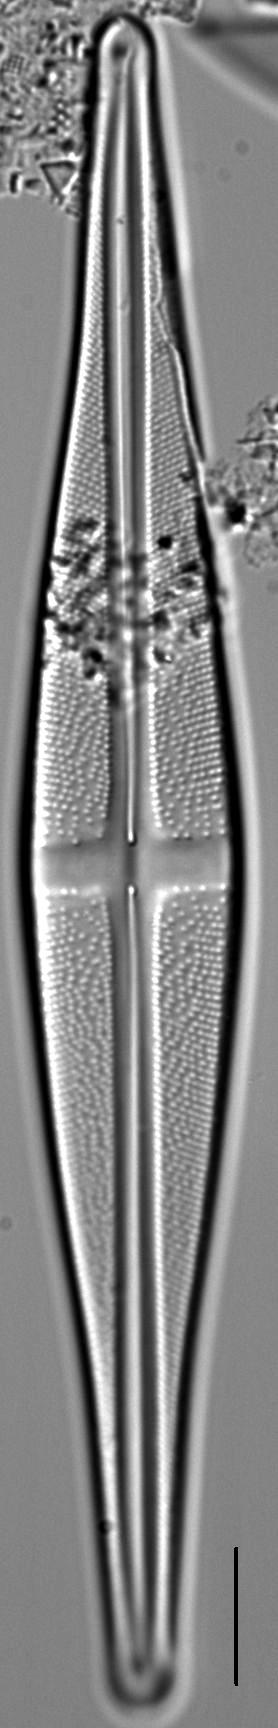 Stauroneis baconiana LM6